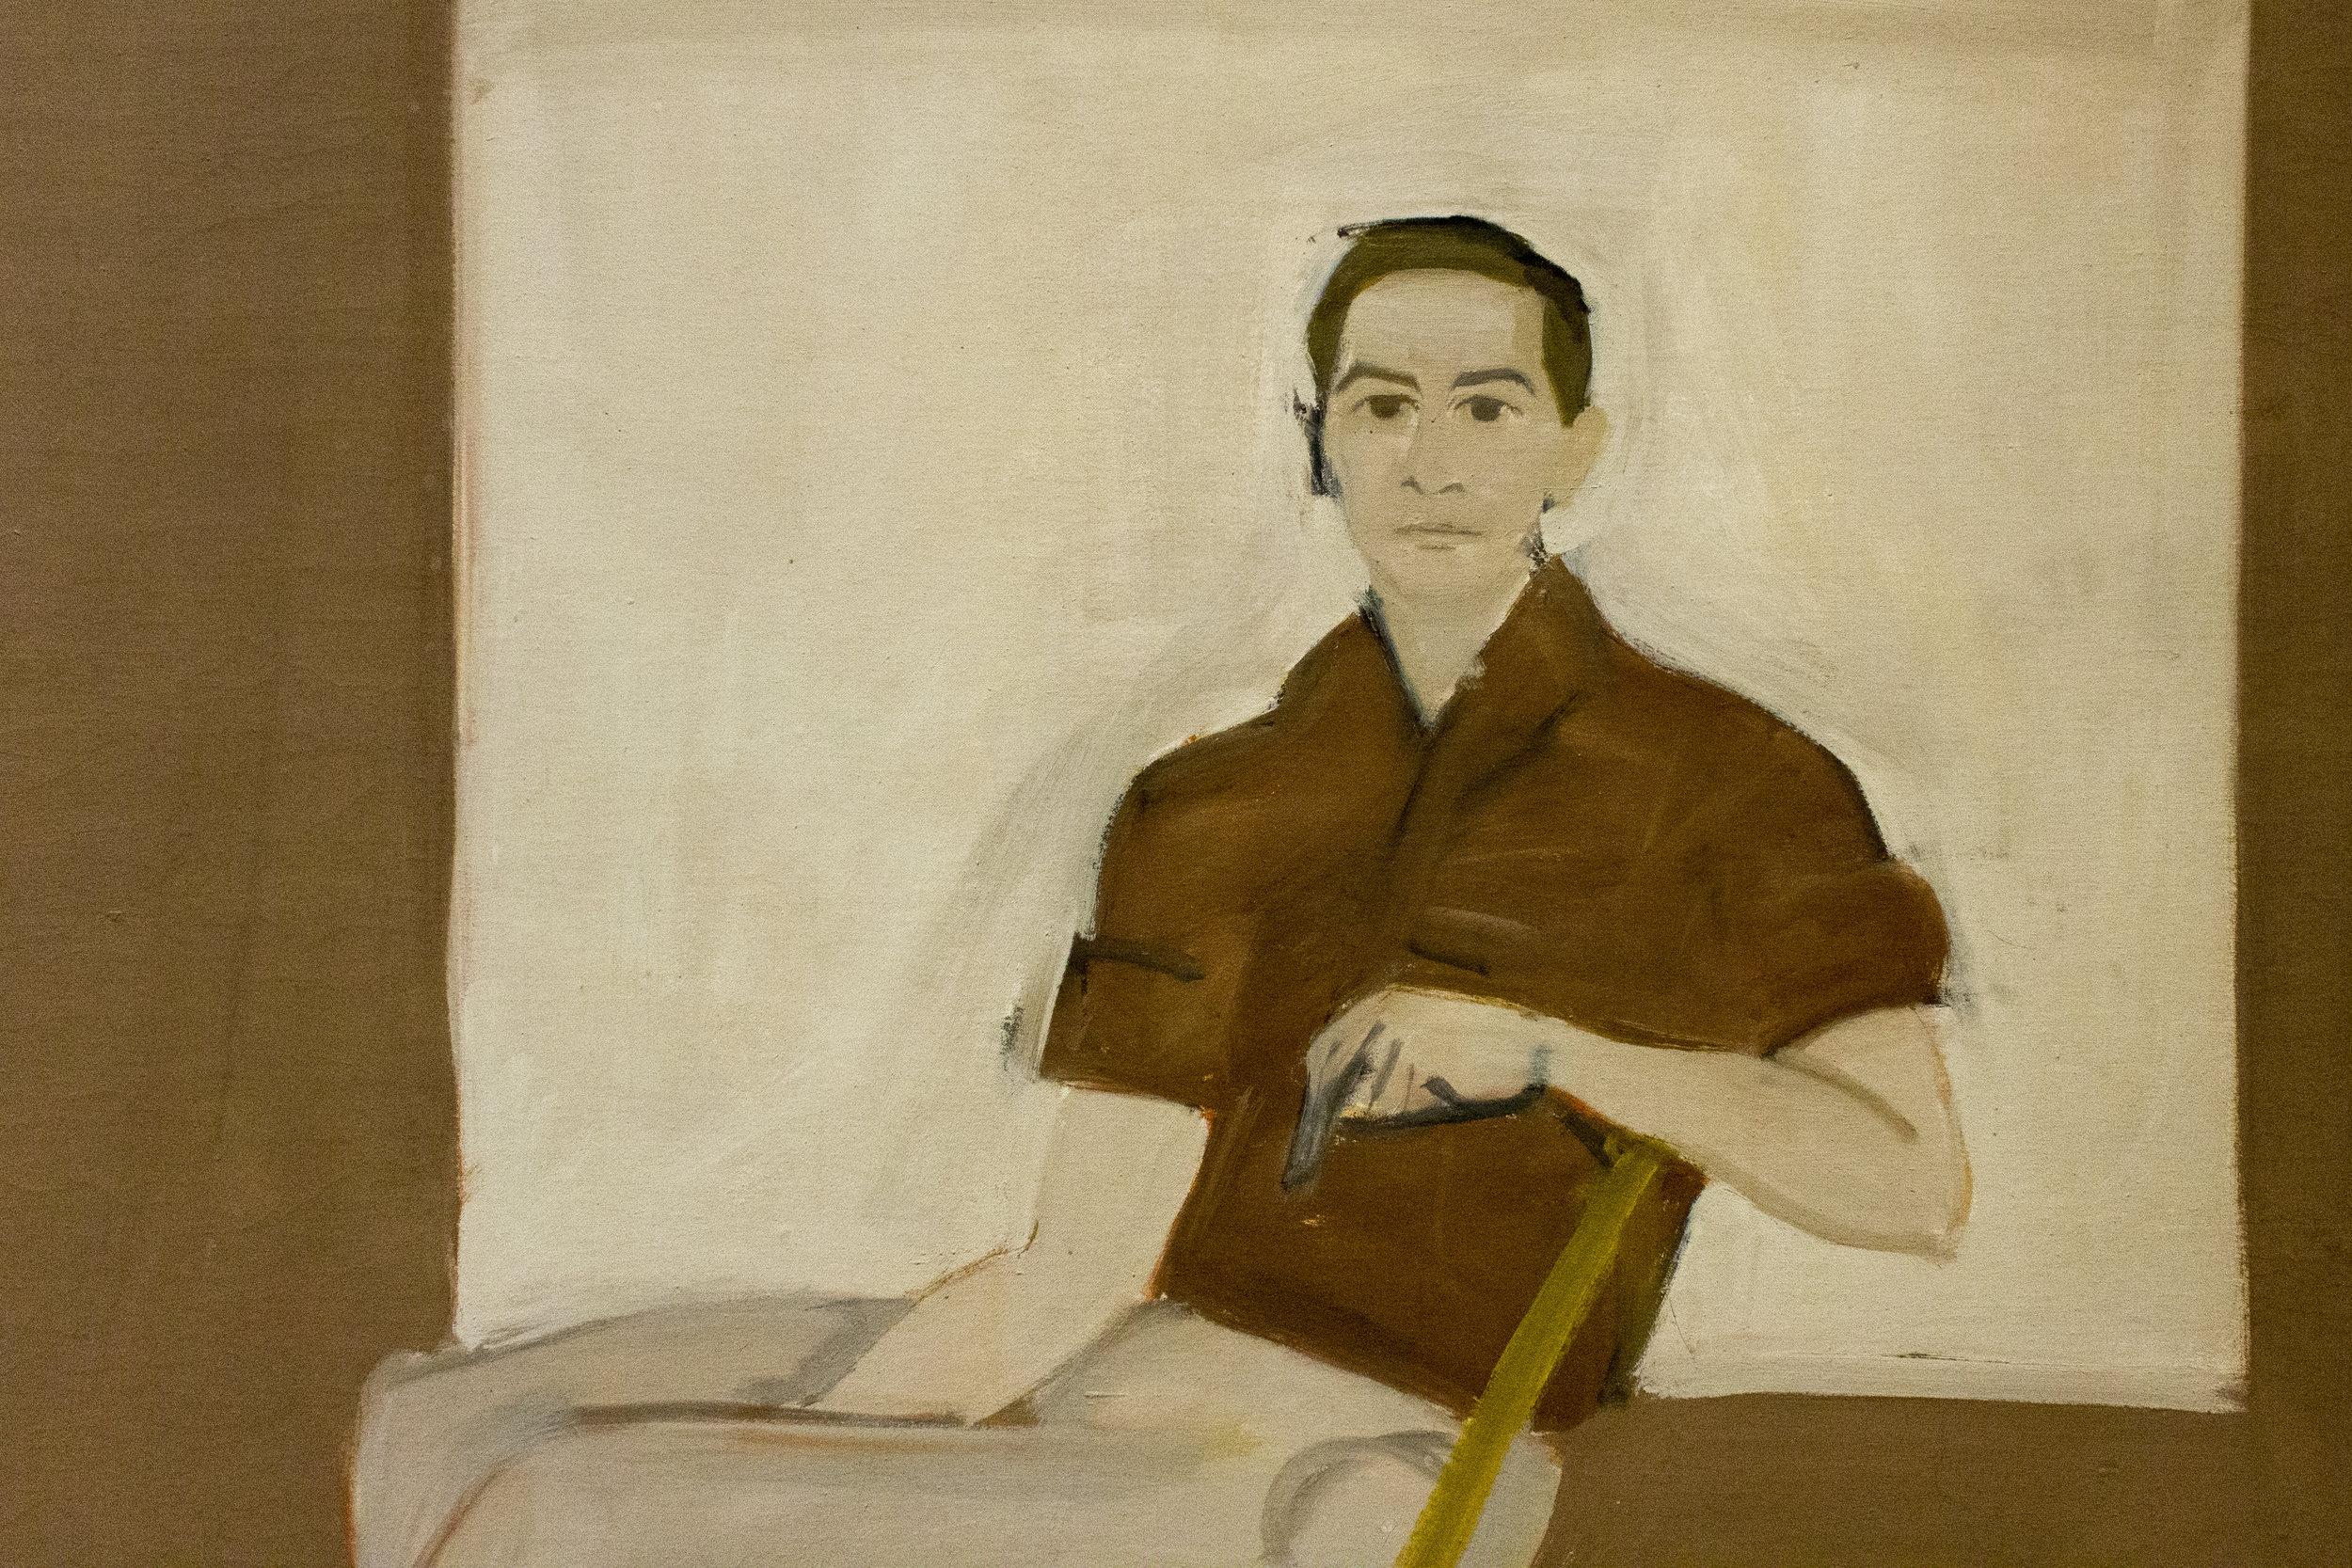 """Double Portrait of Robert Rauschenberg""1959. Oil on canvas. Alex Katz. Image courtesy of author."